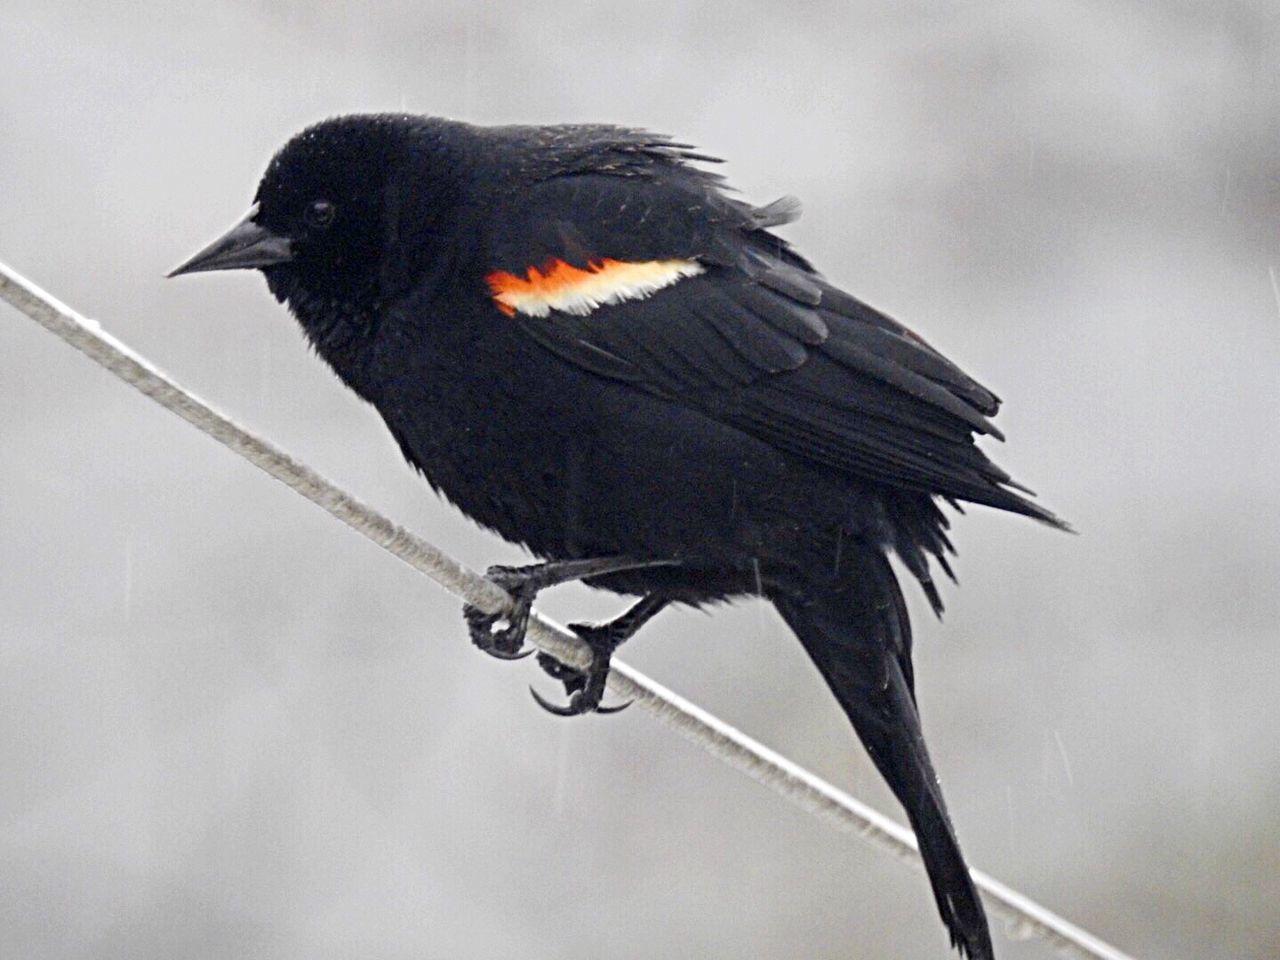 animals in the wild, bird, animal themes, one animal, perching, no people, outdoors, animal wildlife, crow, raven - bird, black color, close-up, day, blackbird, nature